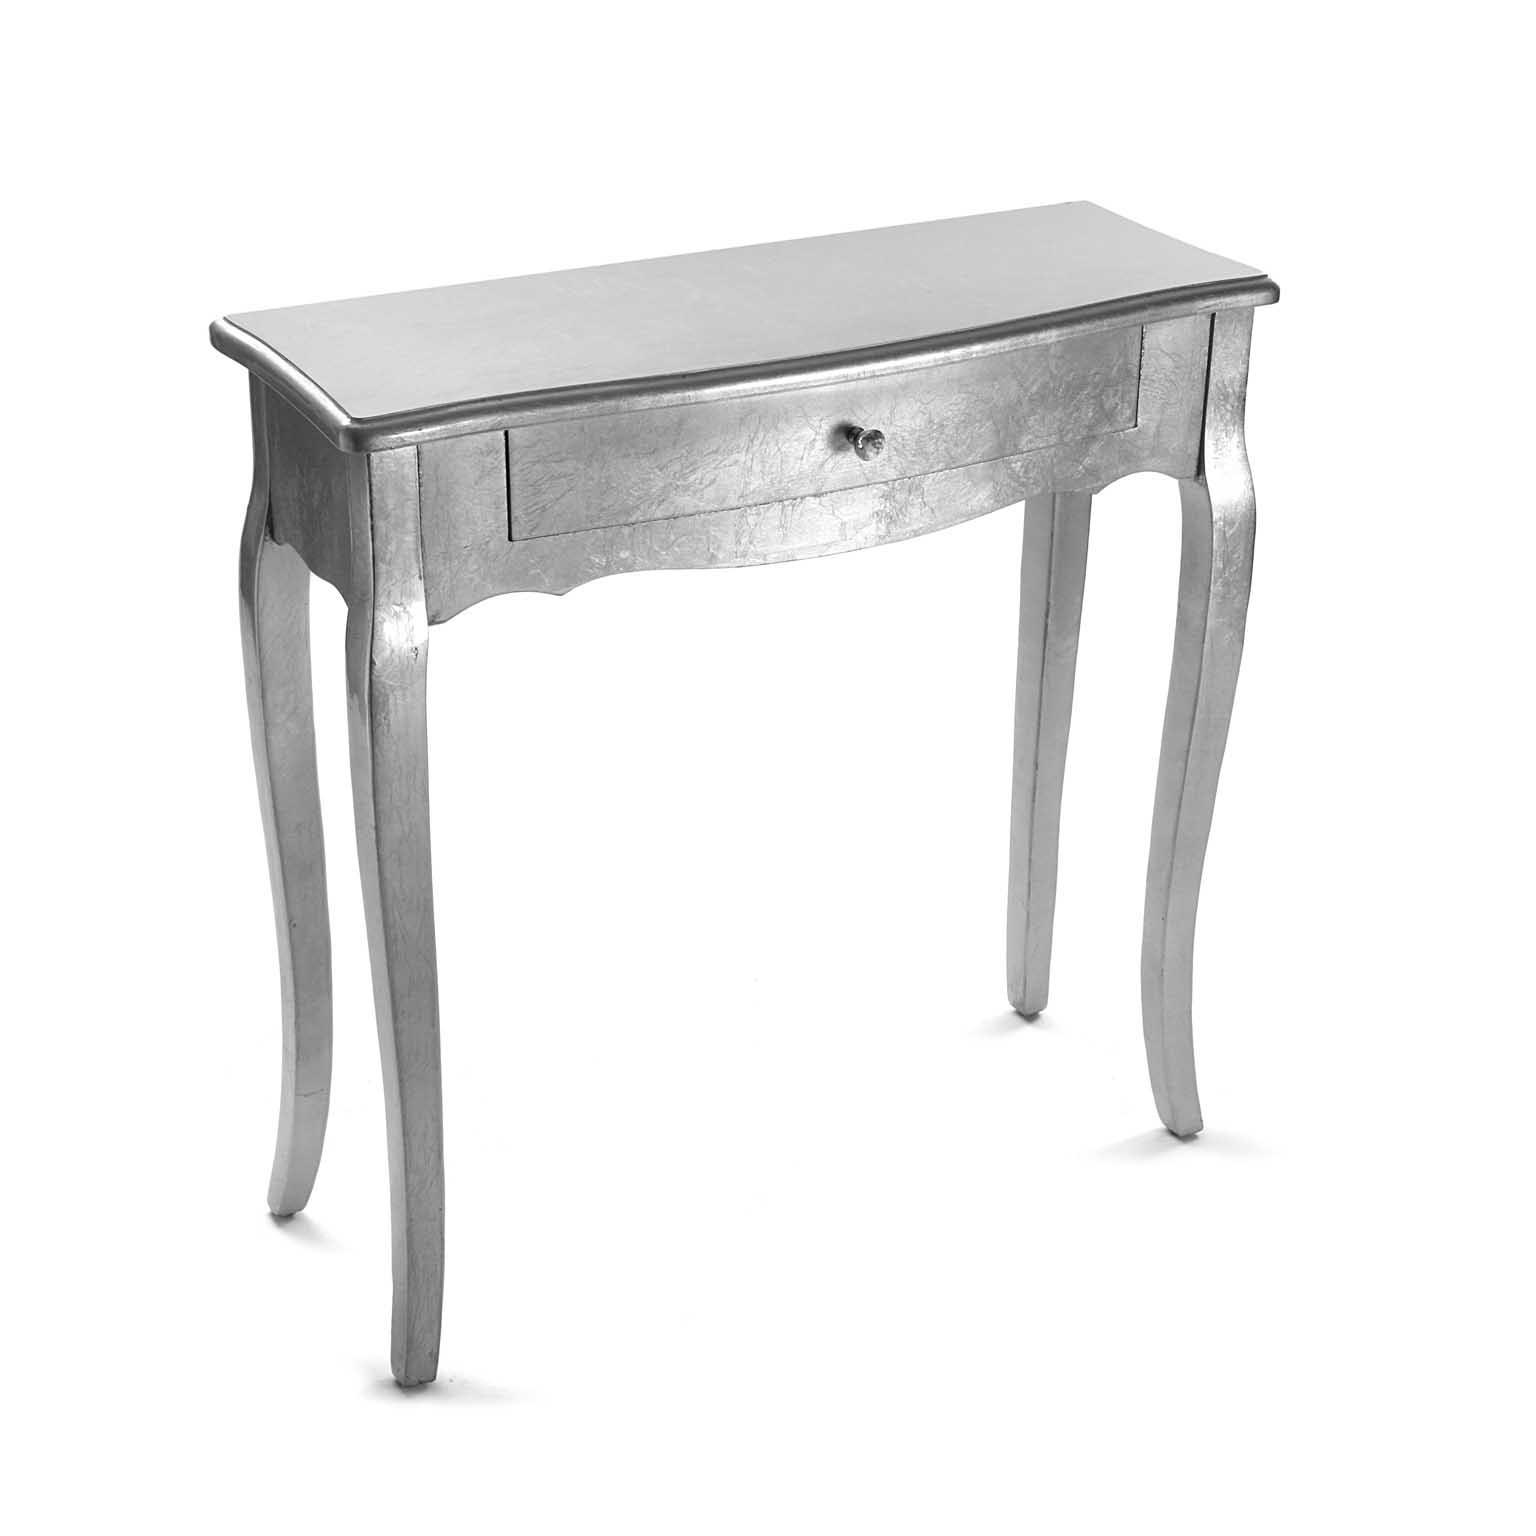 31445-consola-argento-plata.jpg